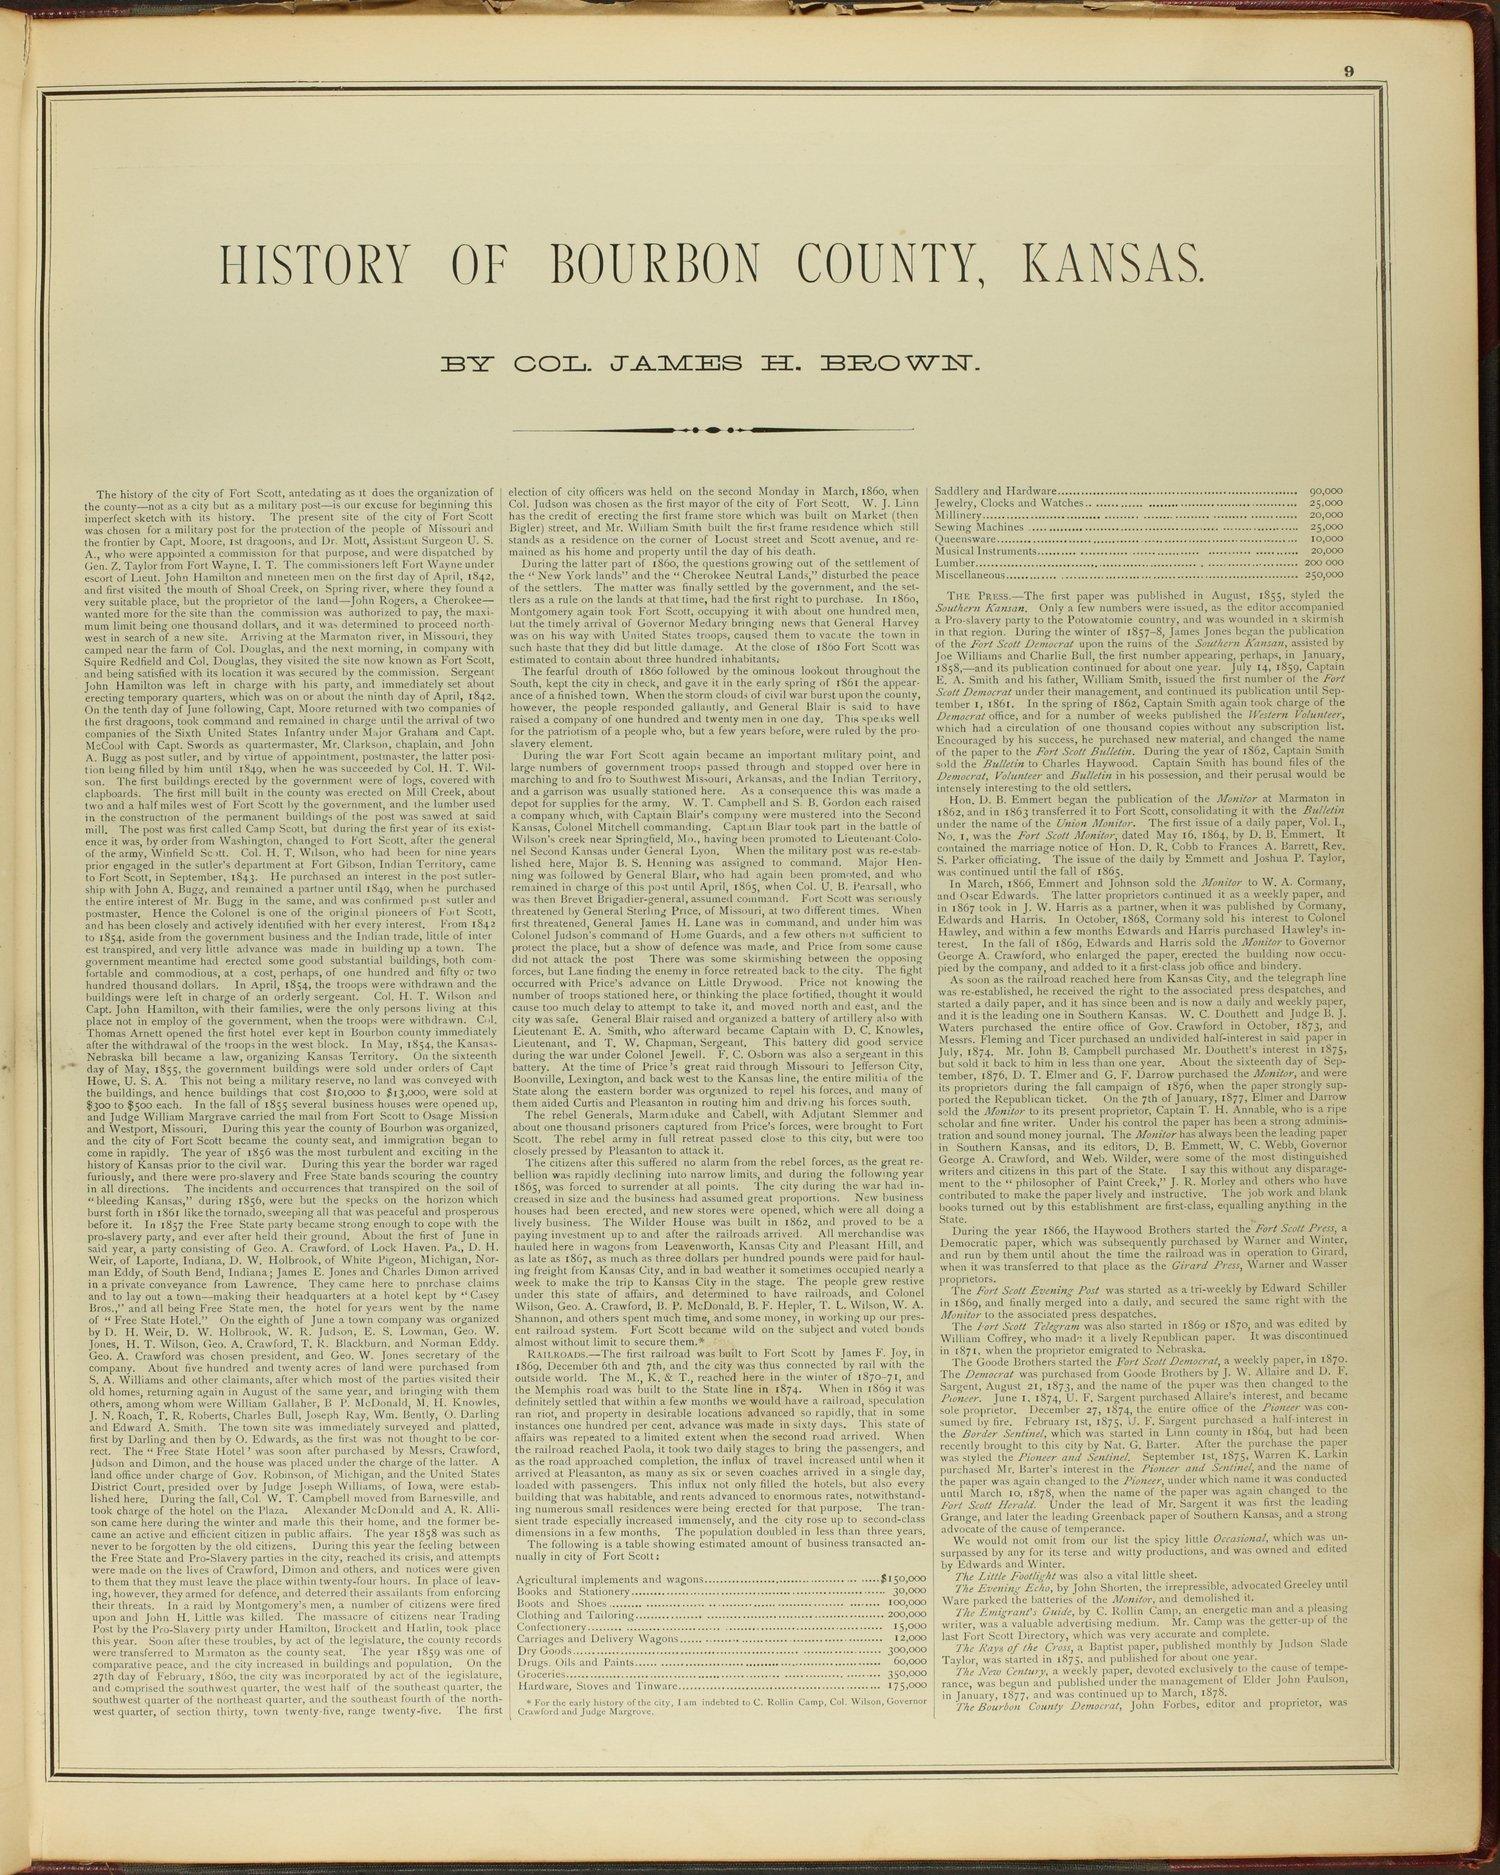 An illustrated historical atlas of Bourbon County, Kansas - 9